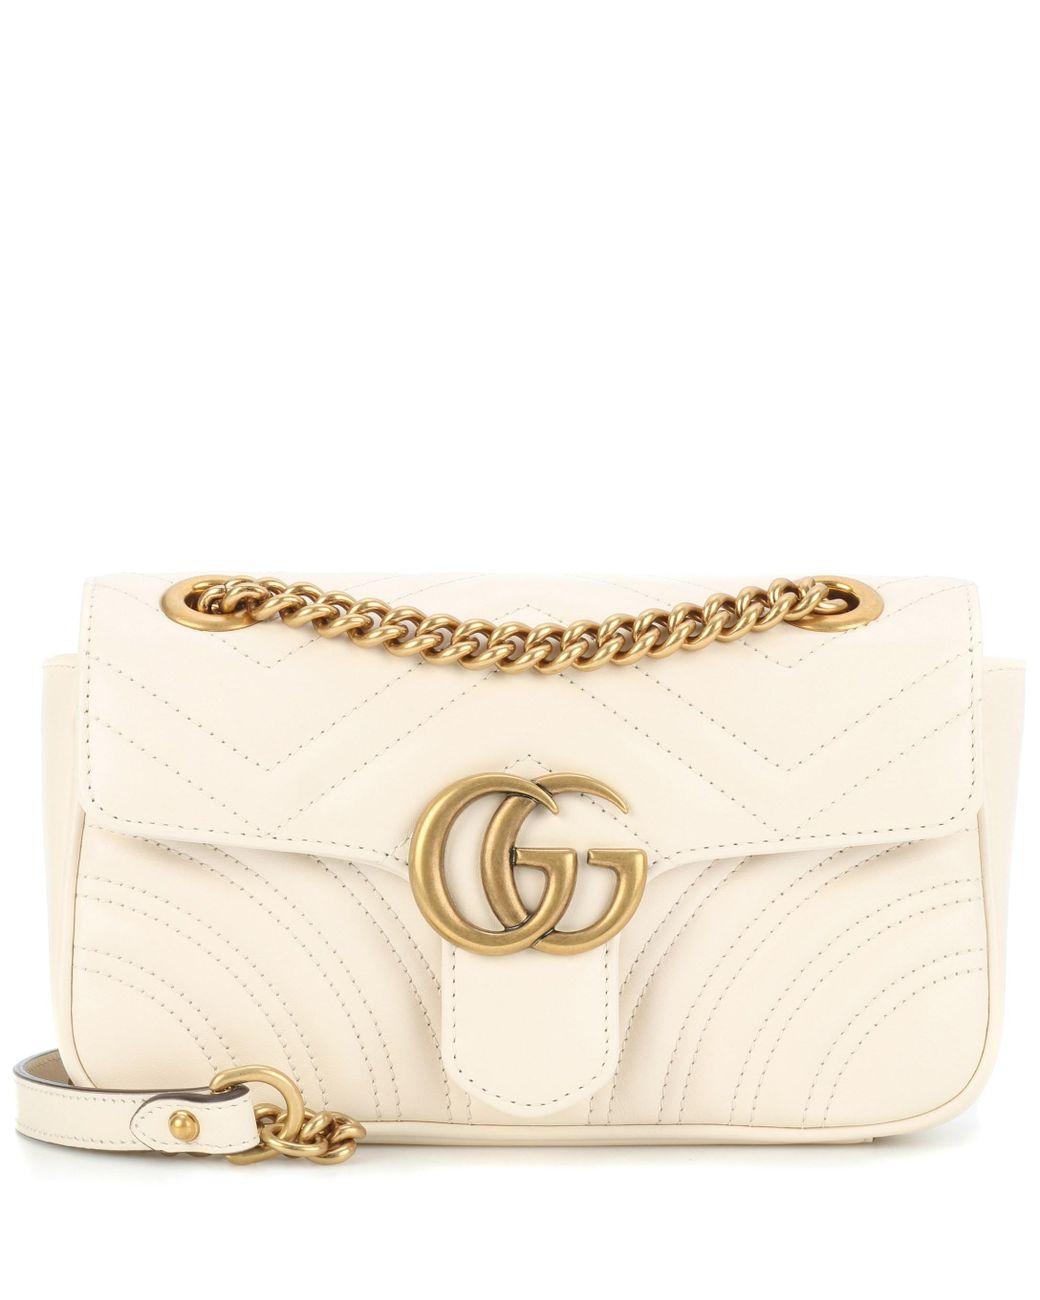 2e93b45d306 Gucci. Women s GG Marmont Mini Crossbody Bag